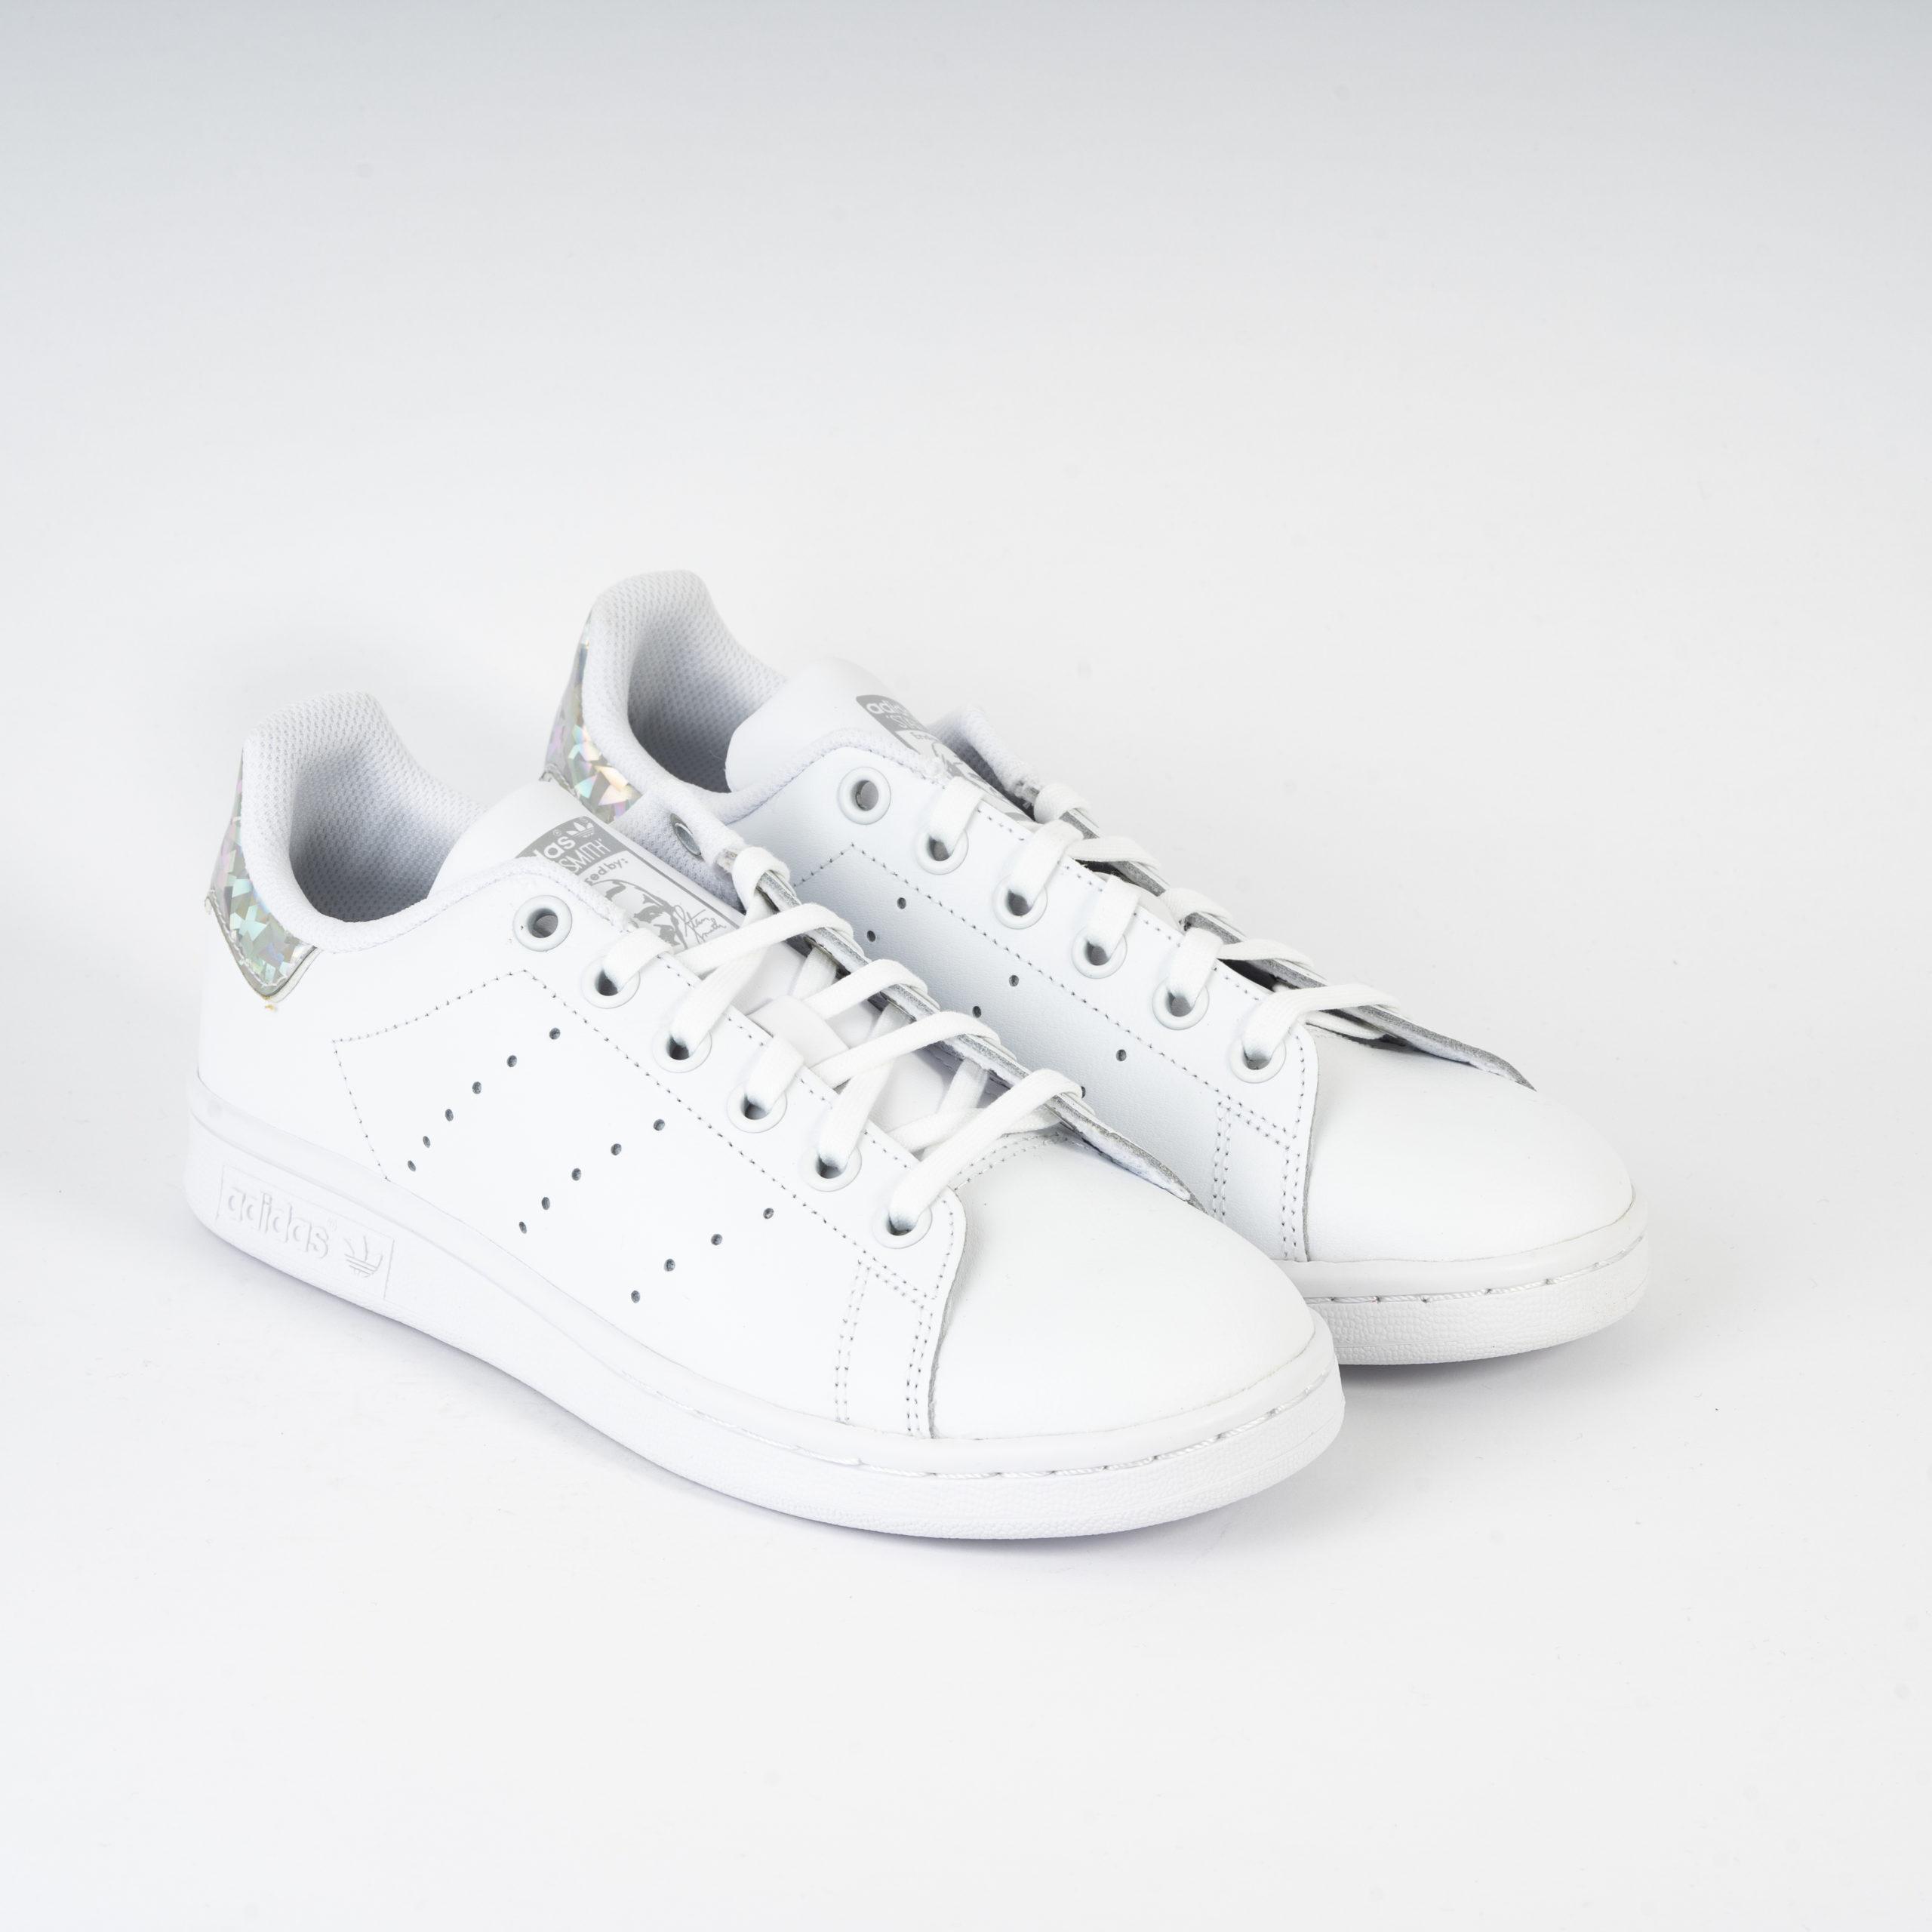 scarpe adidas 2016 bambini